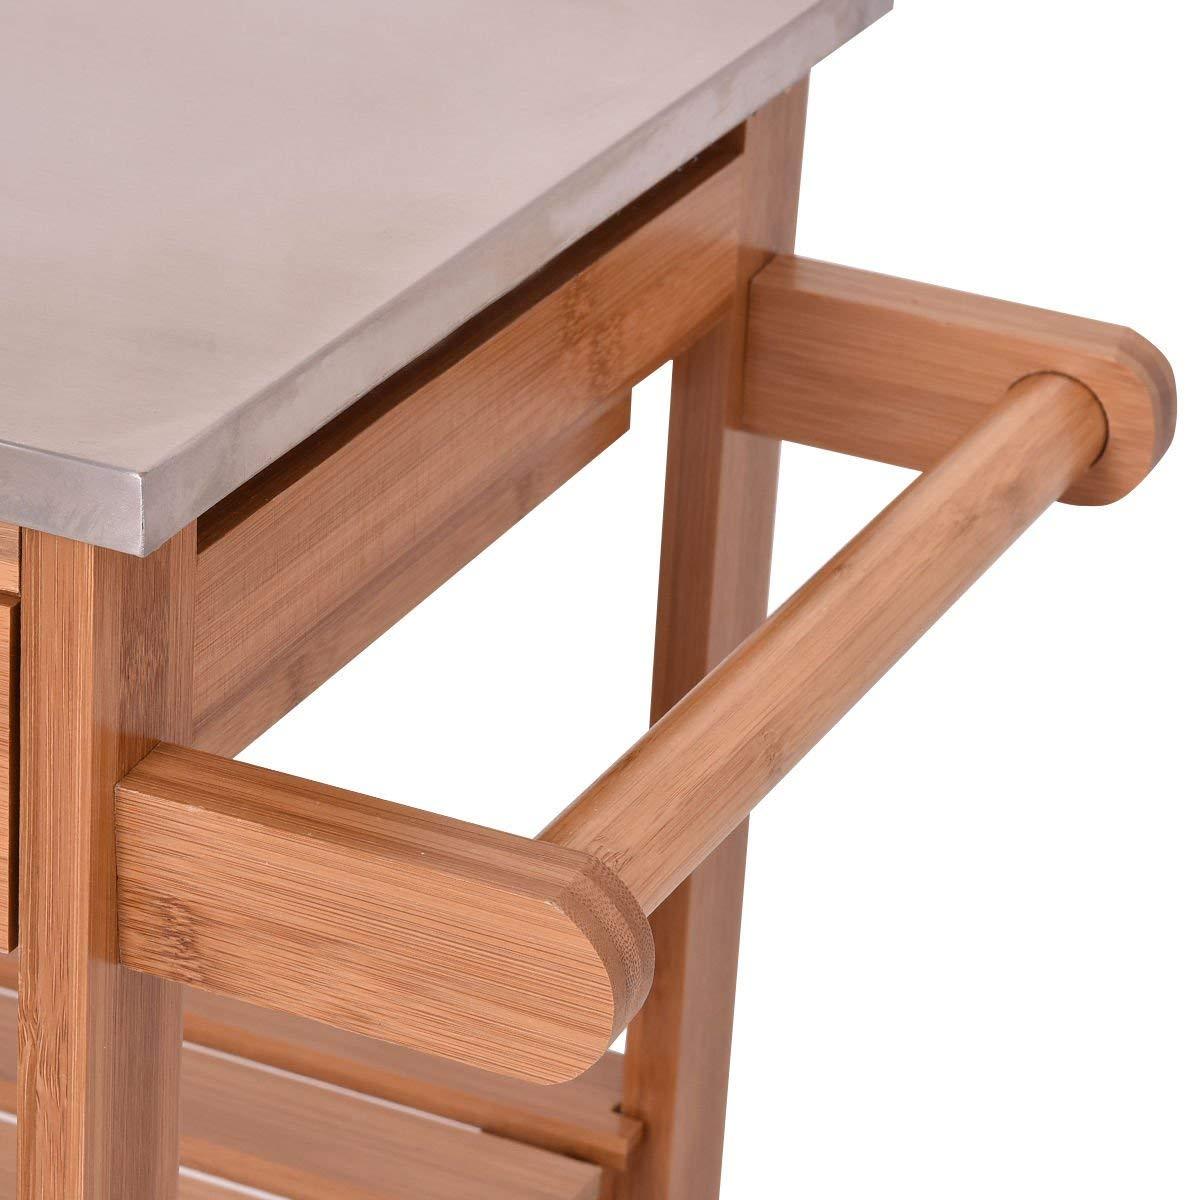 Bamboo portable Rolling Kitchen Island Trolley Cart Storage Shelf Drawers Basket Dining cart 3